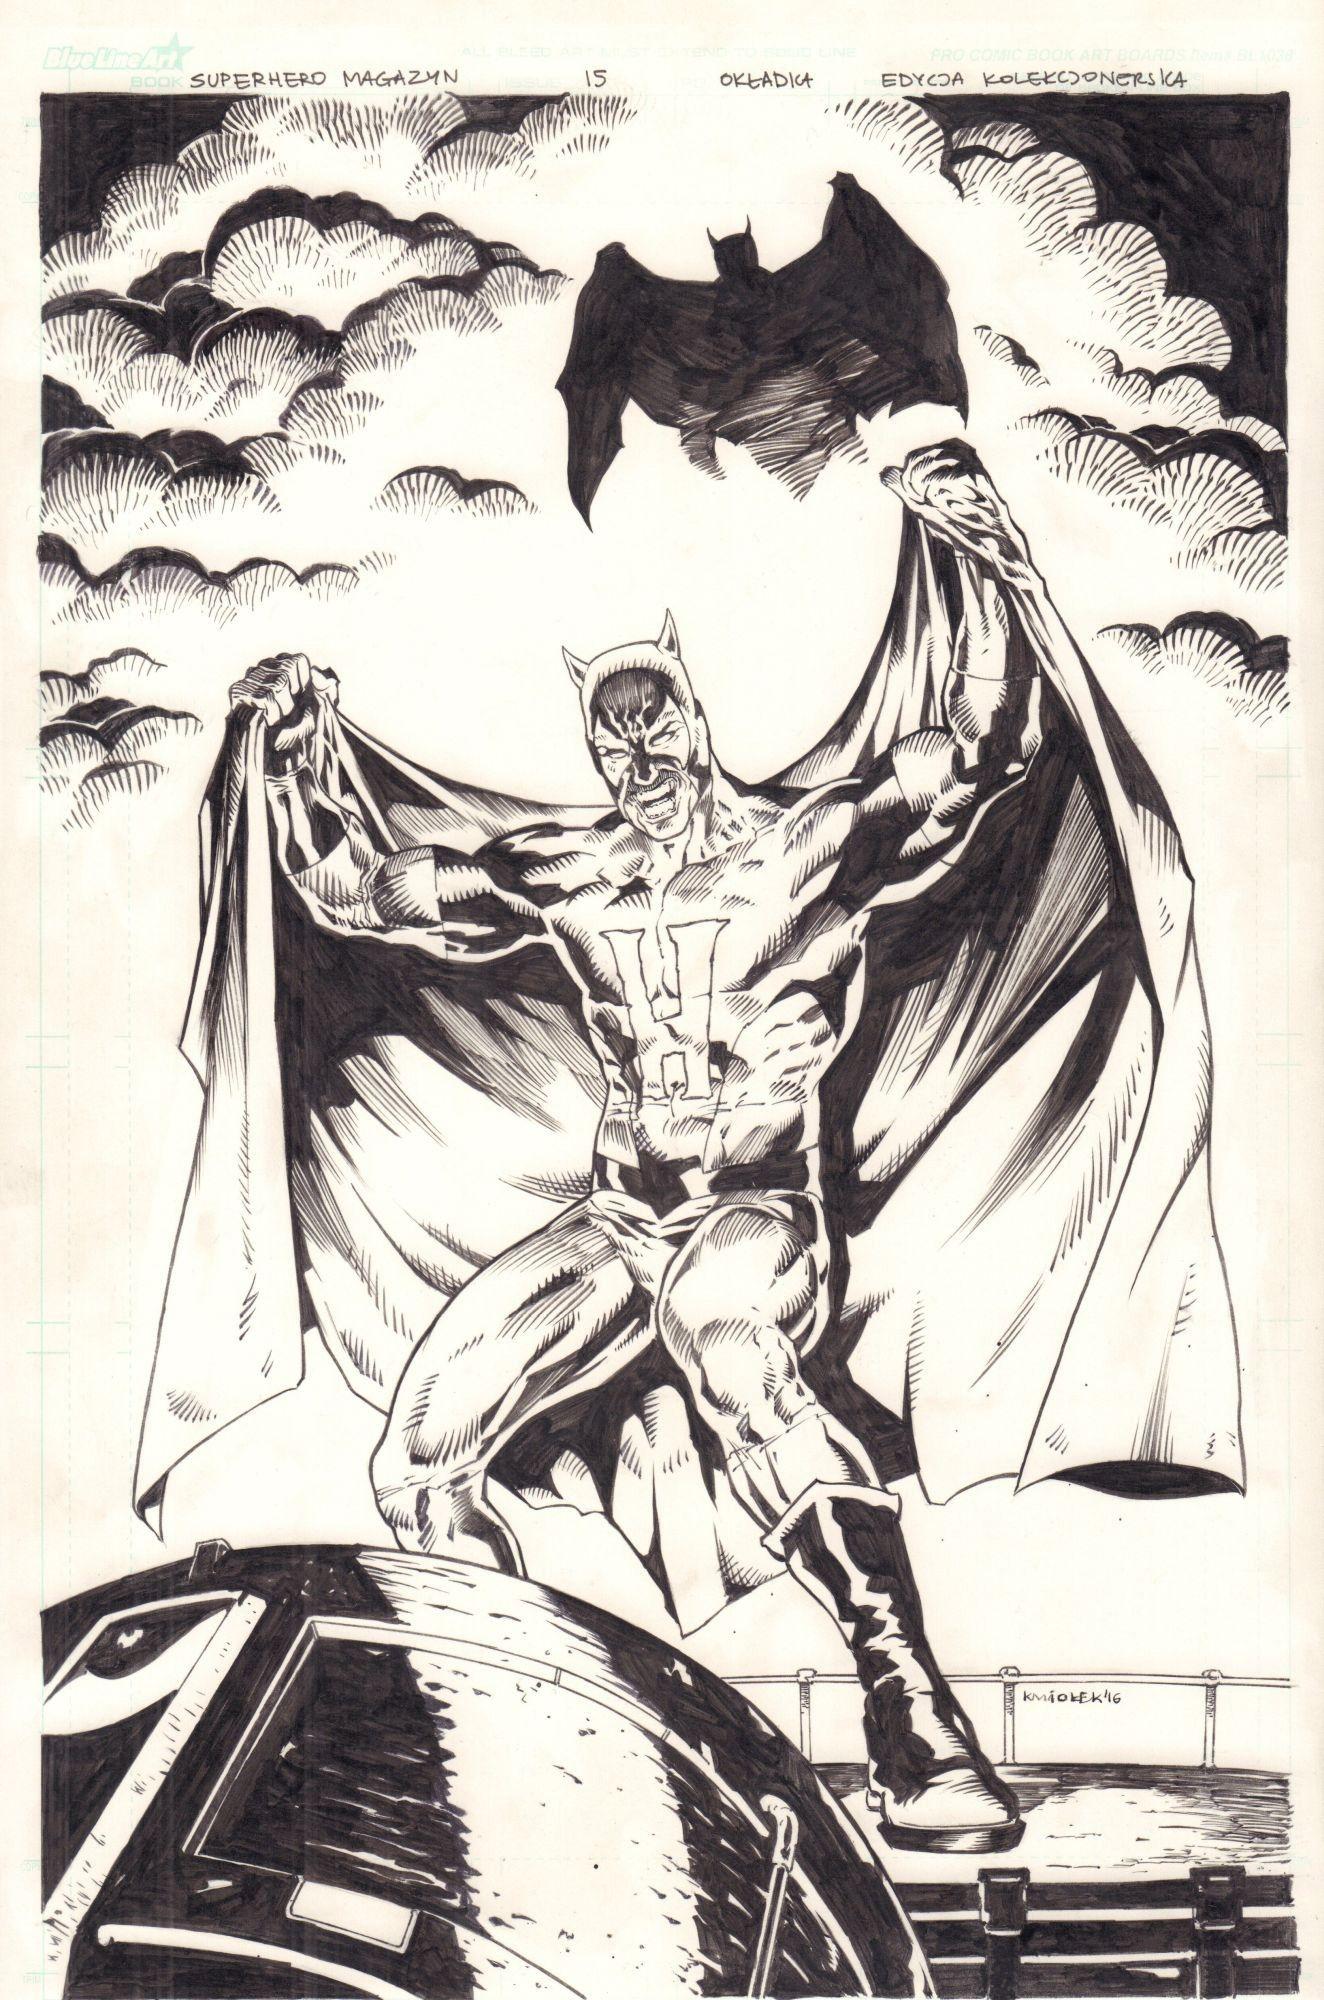 Super Hero #7 - okładka